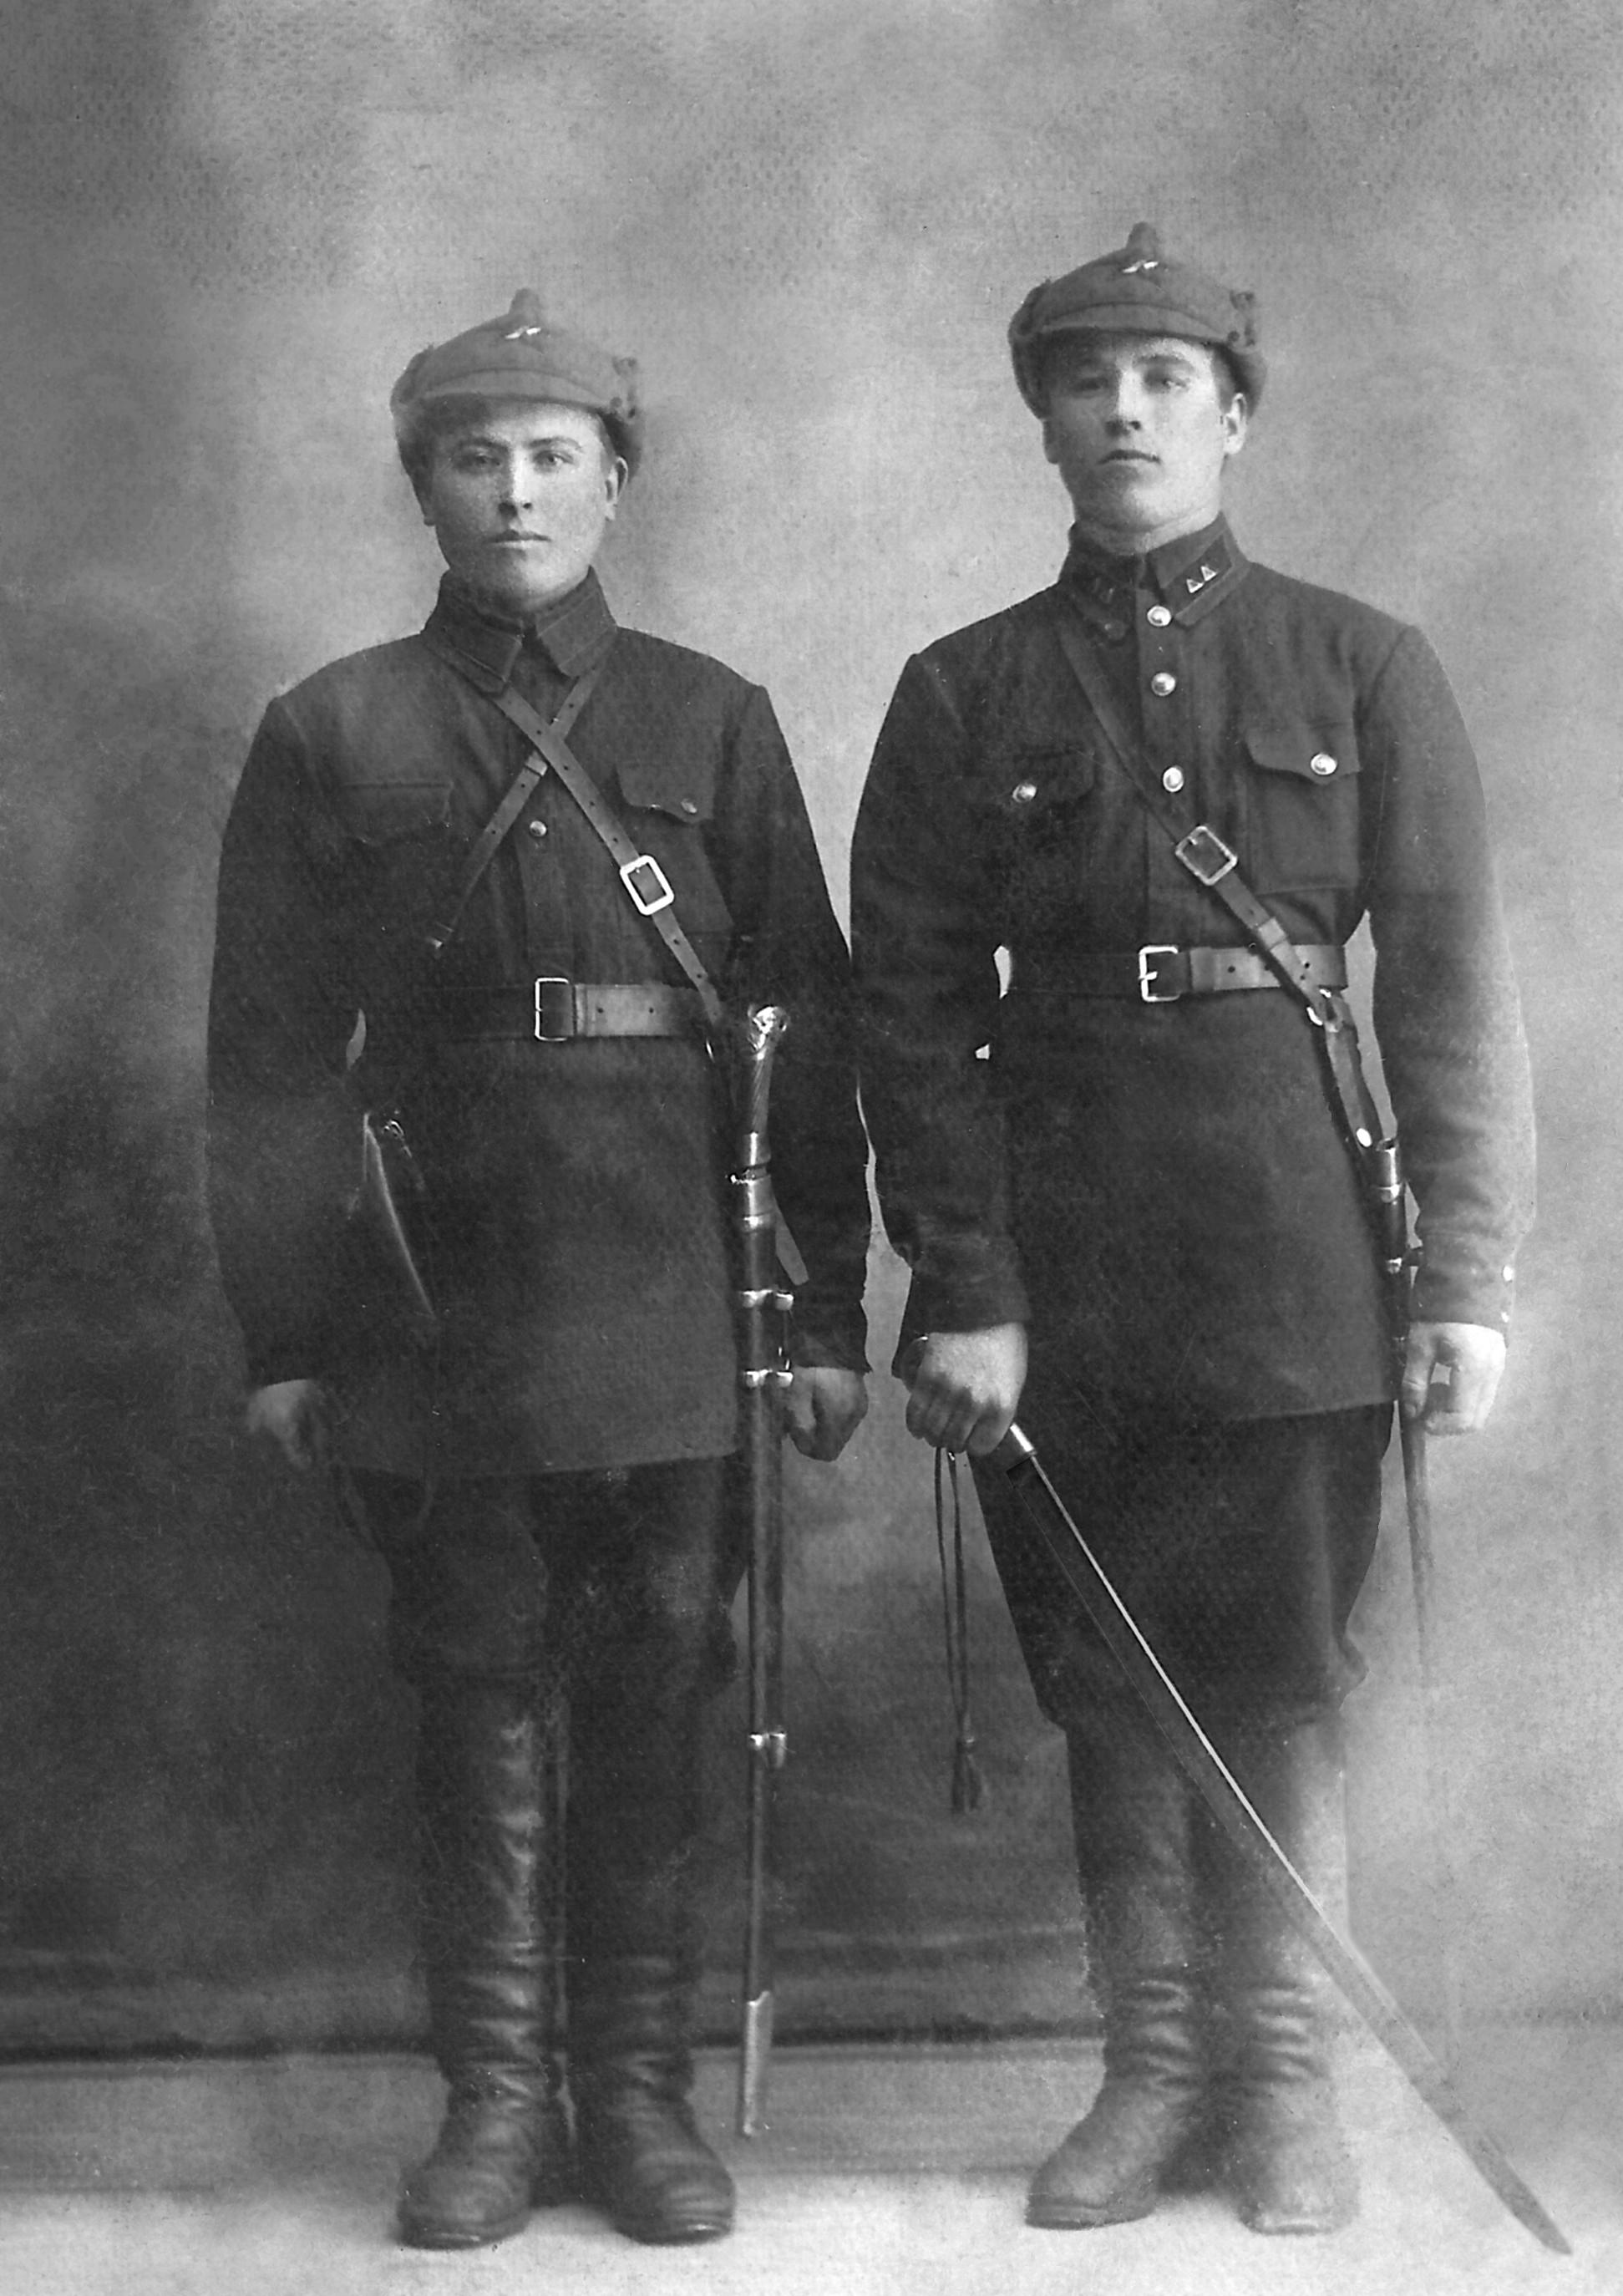 1930-е. Калинин Фёдор Кириллович (слева) из Комиссии по борьбе с бандитизмом принимал участие в разгроме банды и уничтожил её главаря Фрица Дрикиса